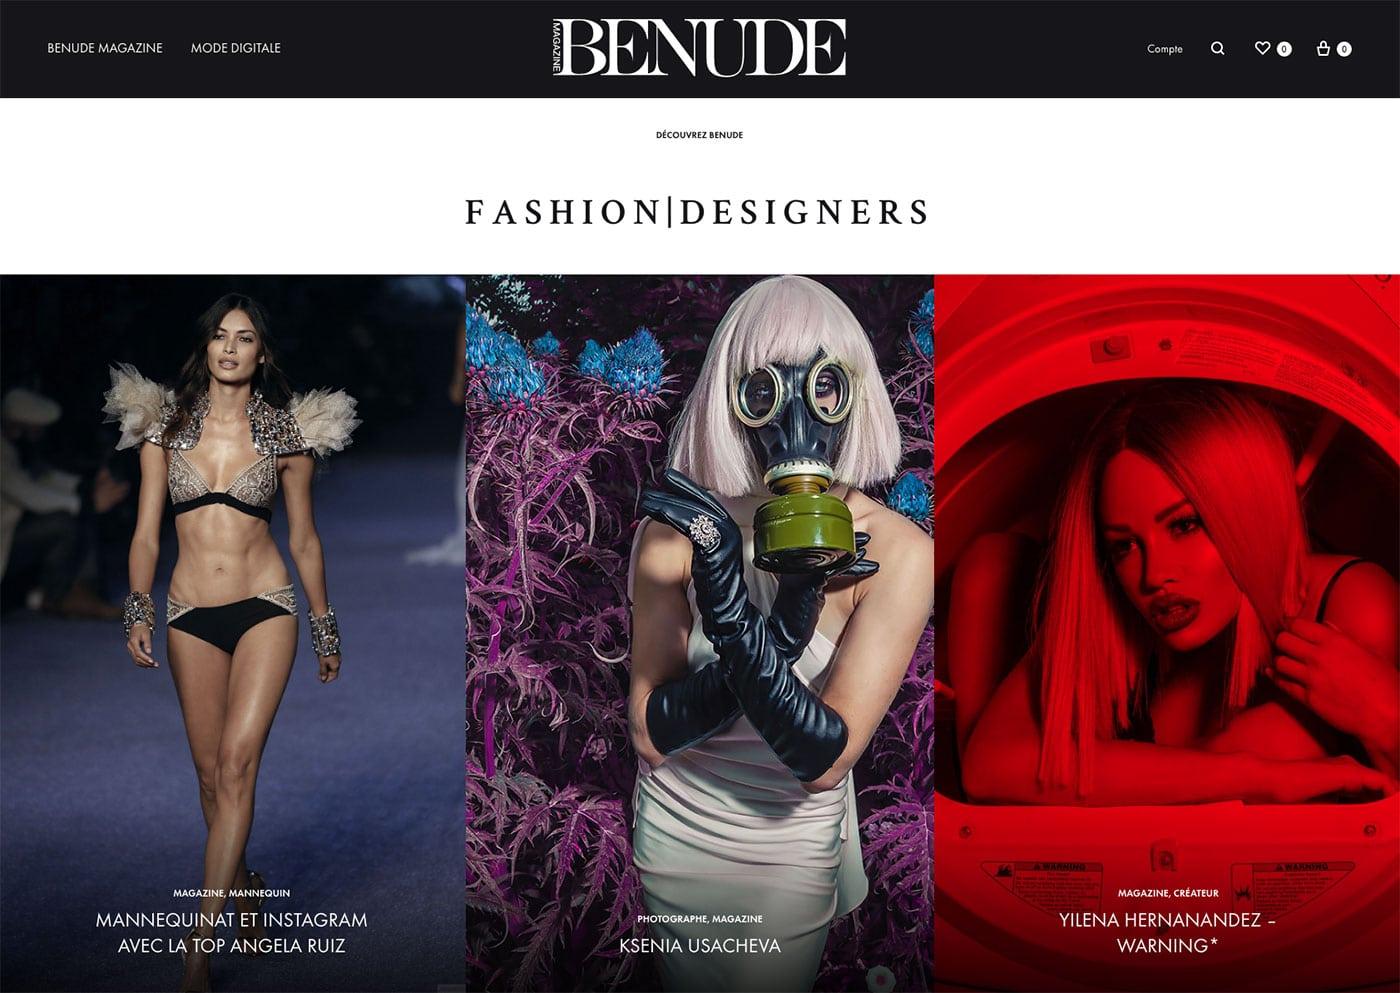 BENUDE magazine cover Angela Ruiz Ksenia Usacheva Yilena Hernandez